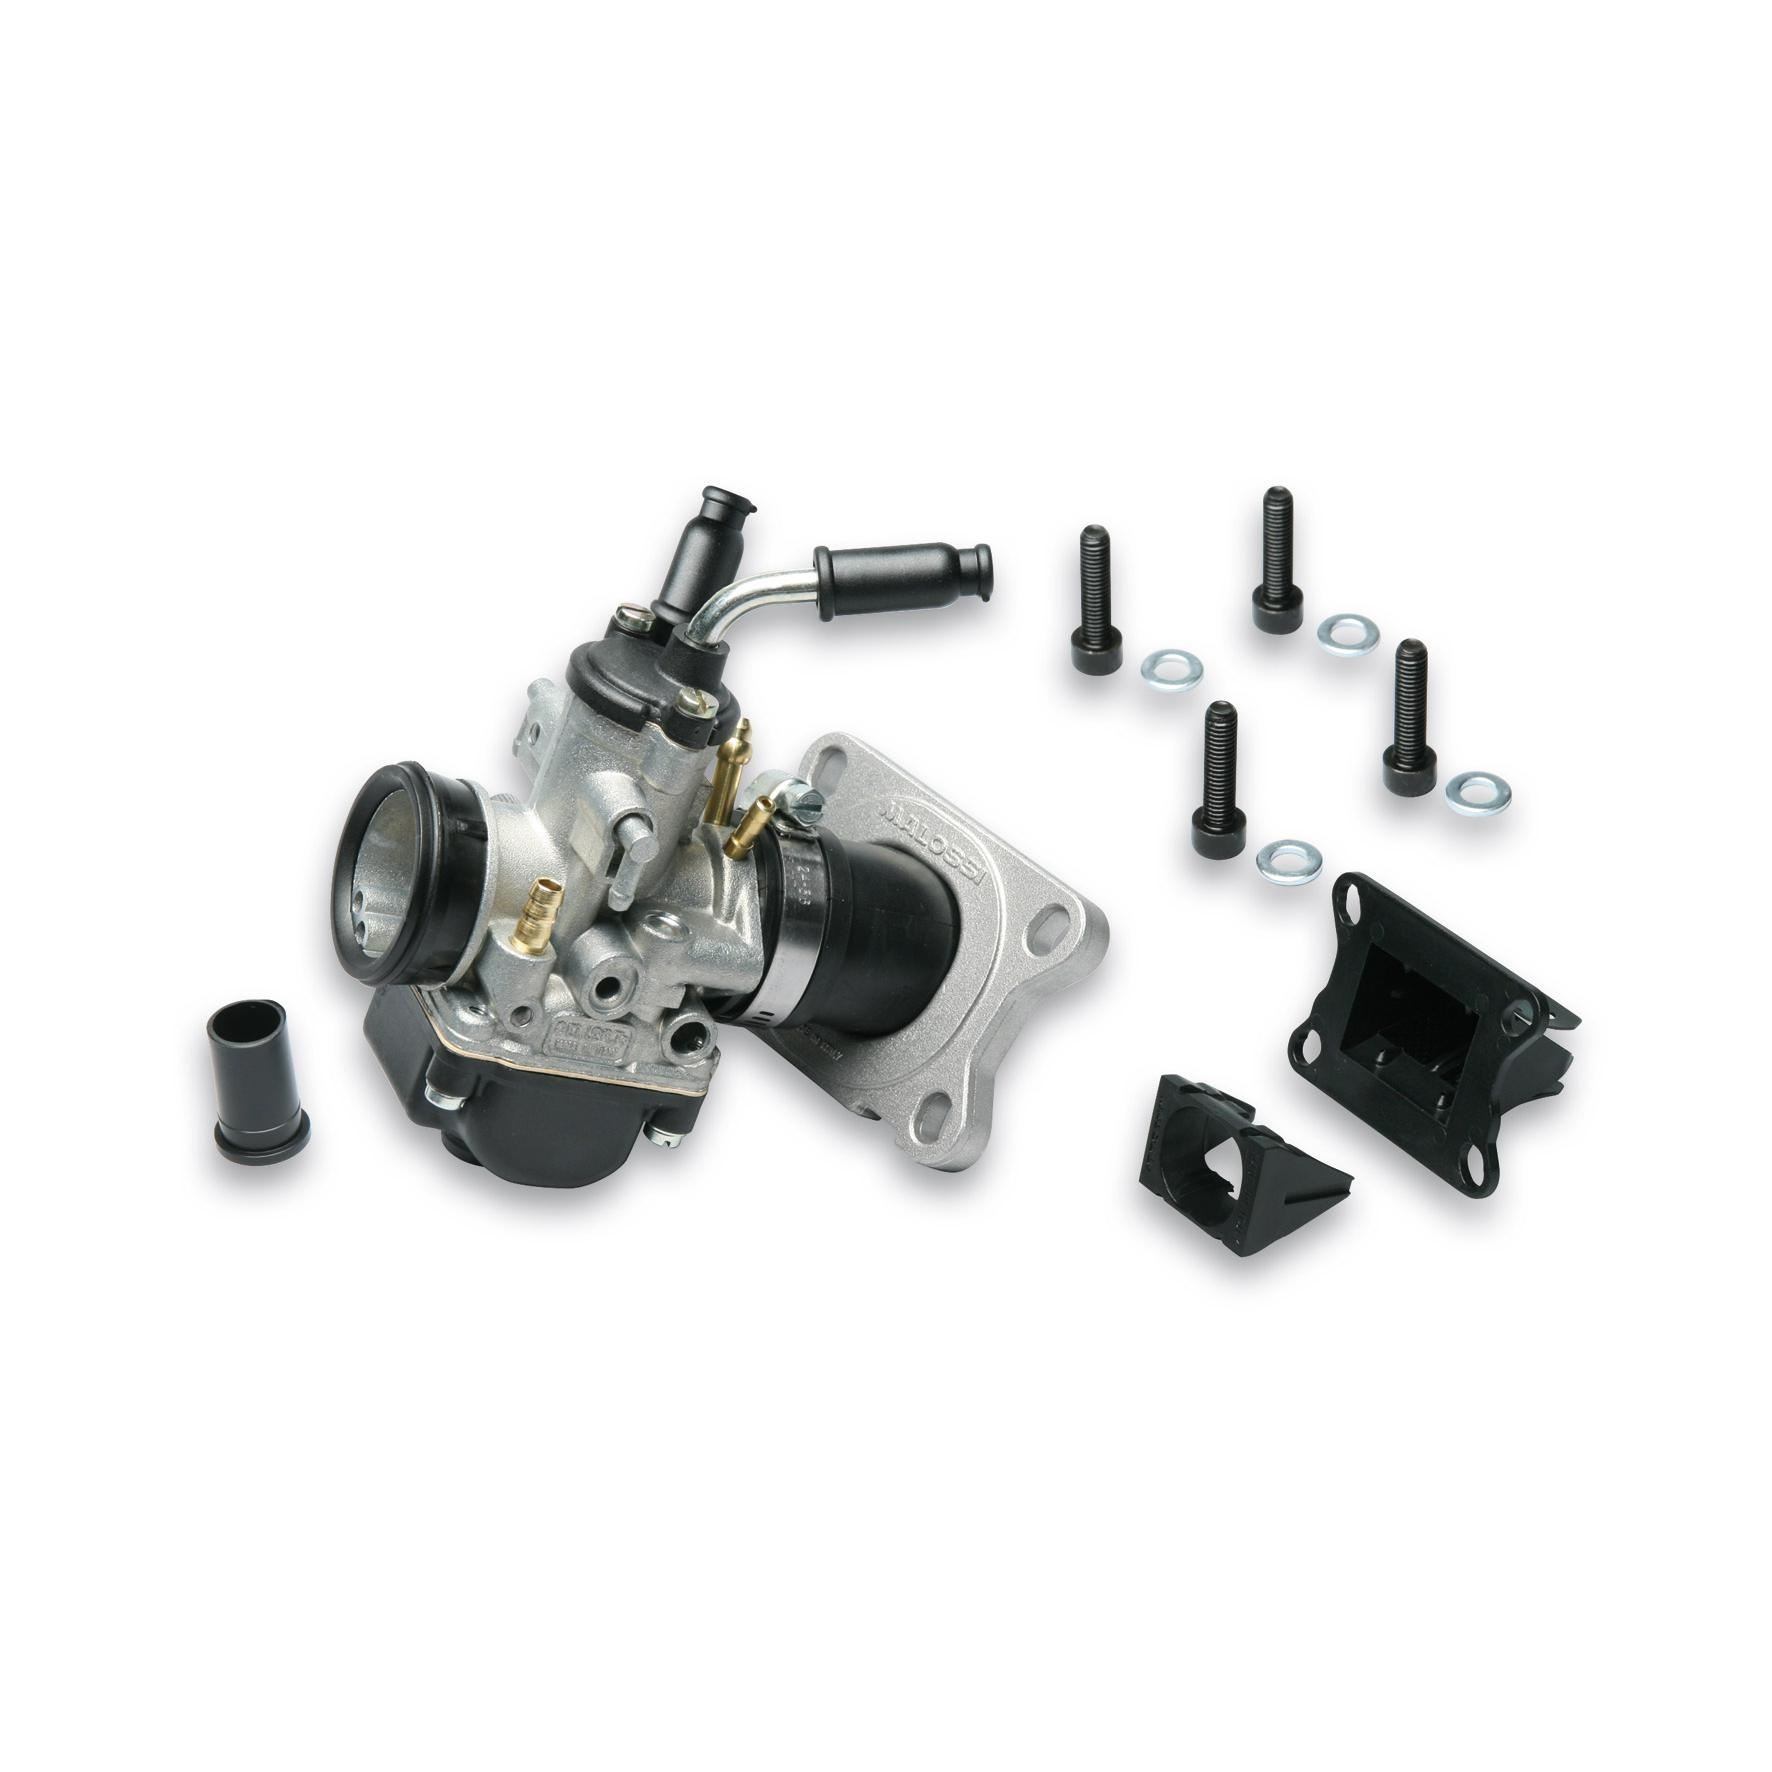 Kit carburateur Malossi PHBG 21 avec starter a câble